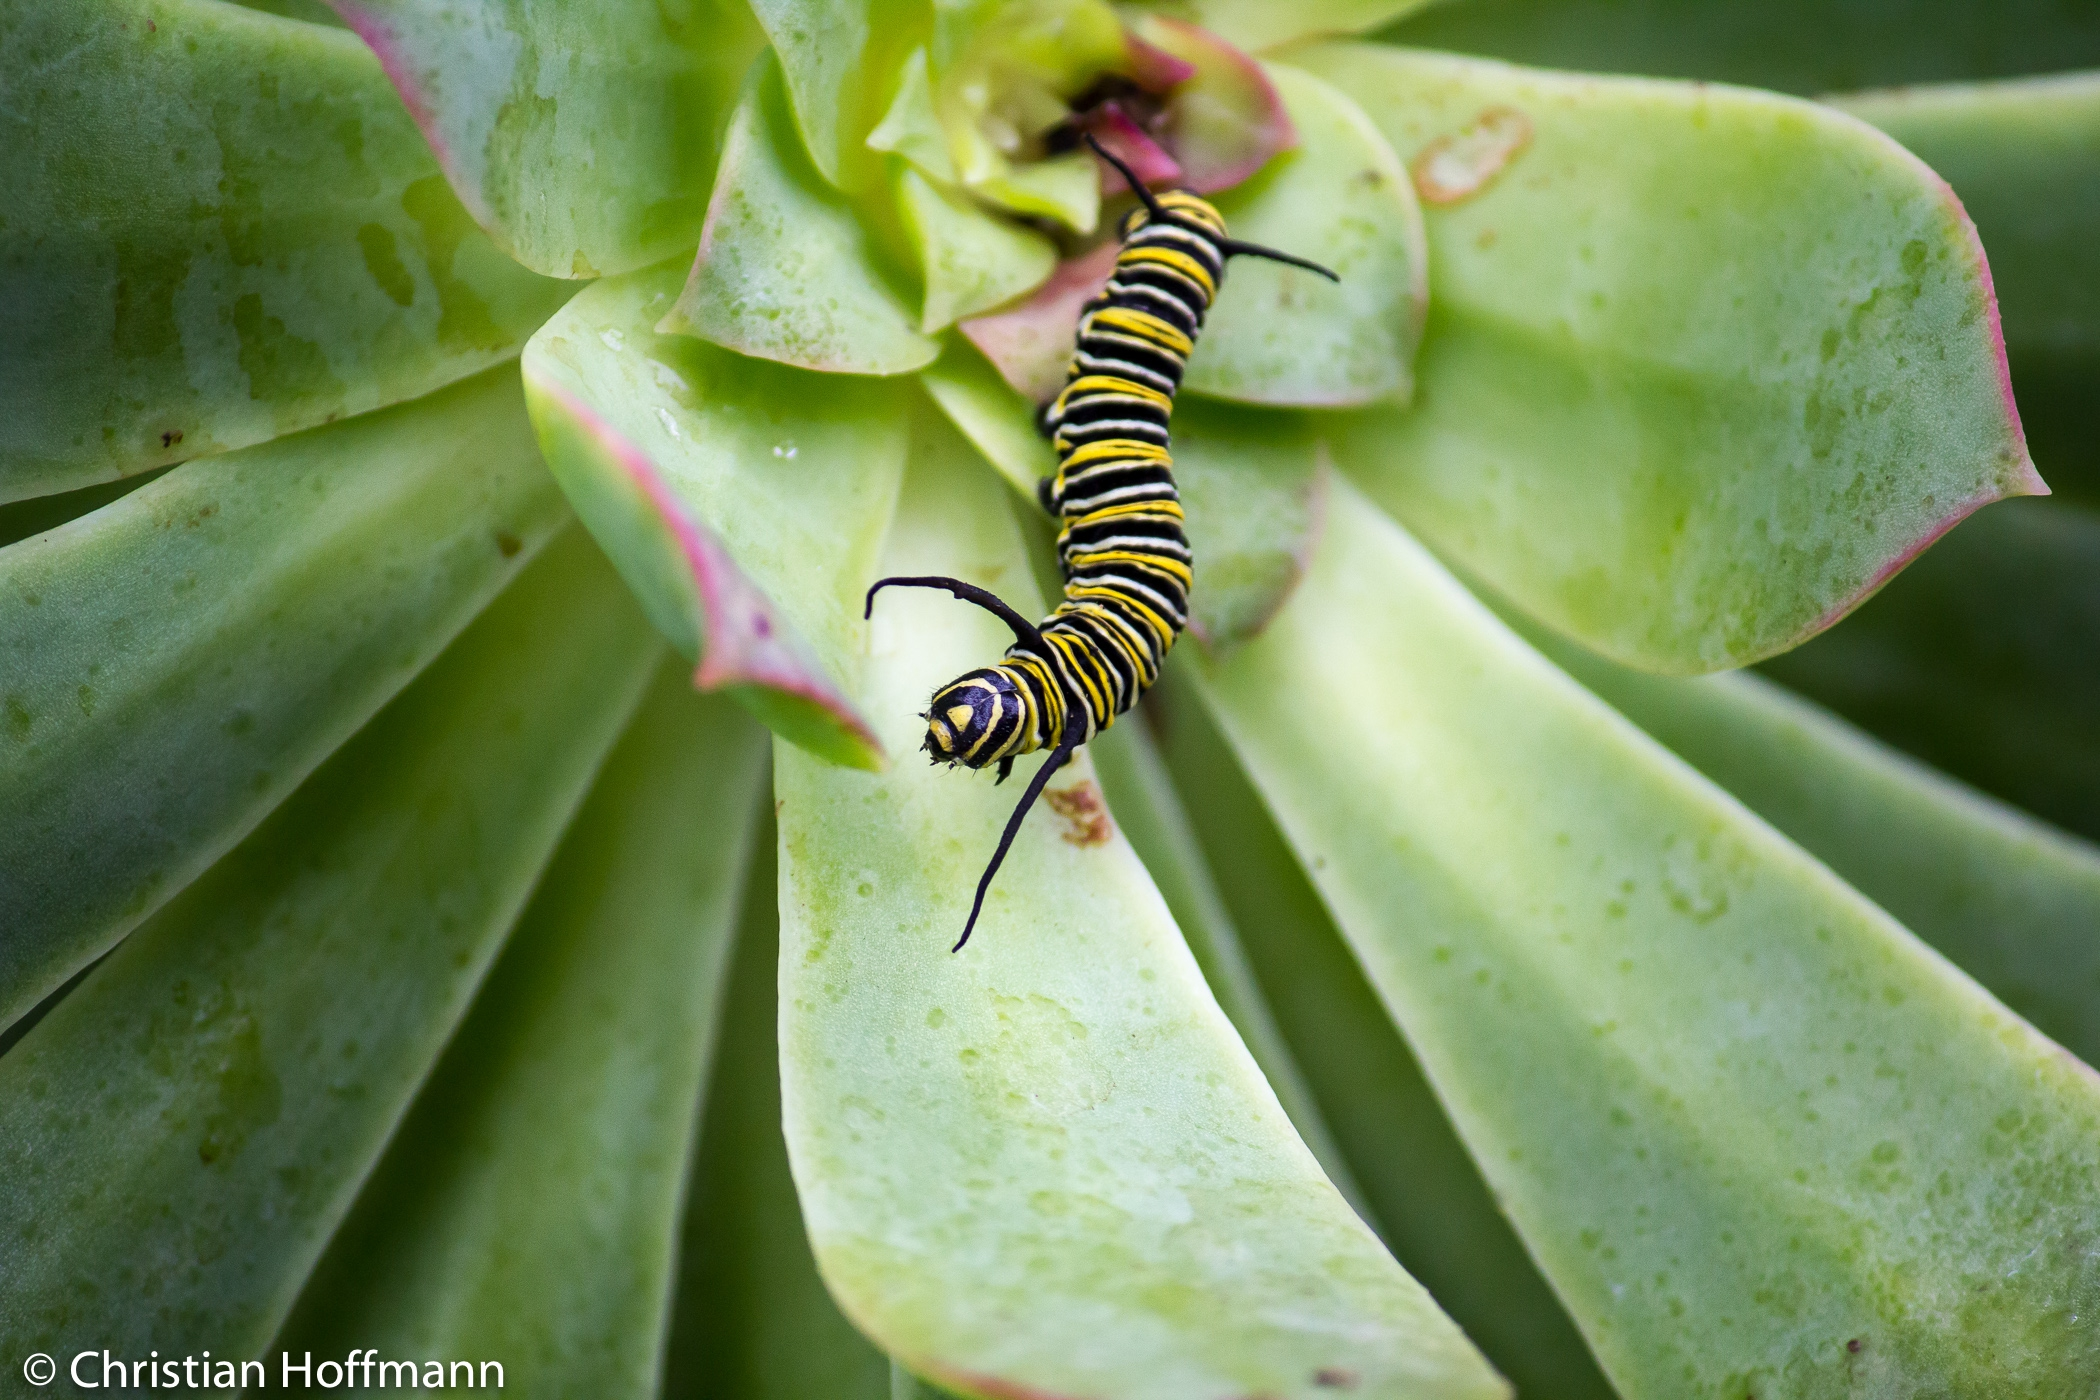 Raupe des Monarchfalters